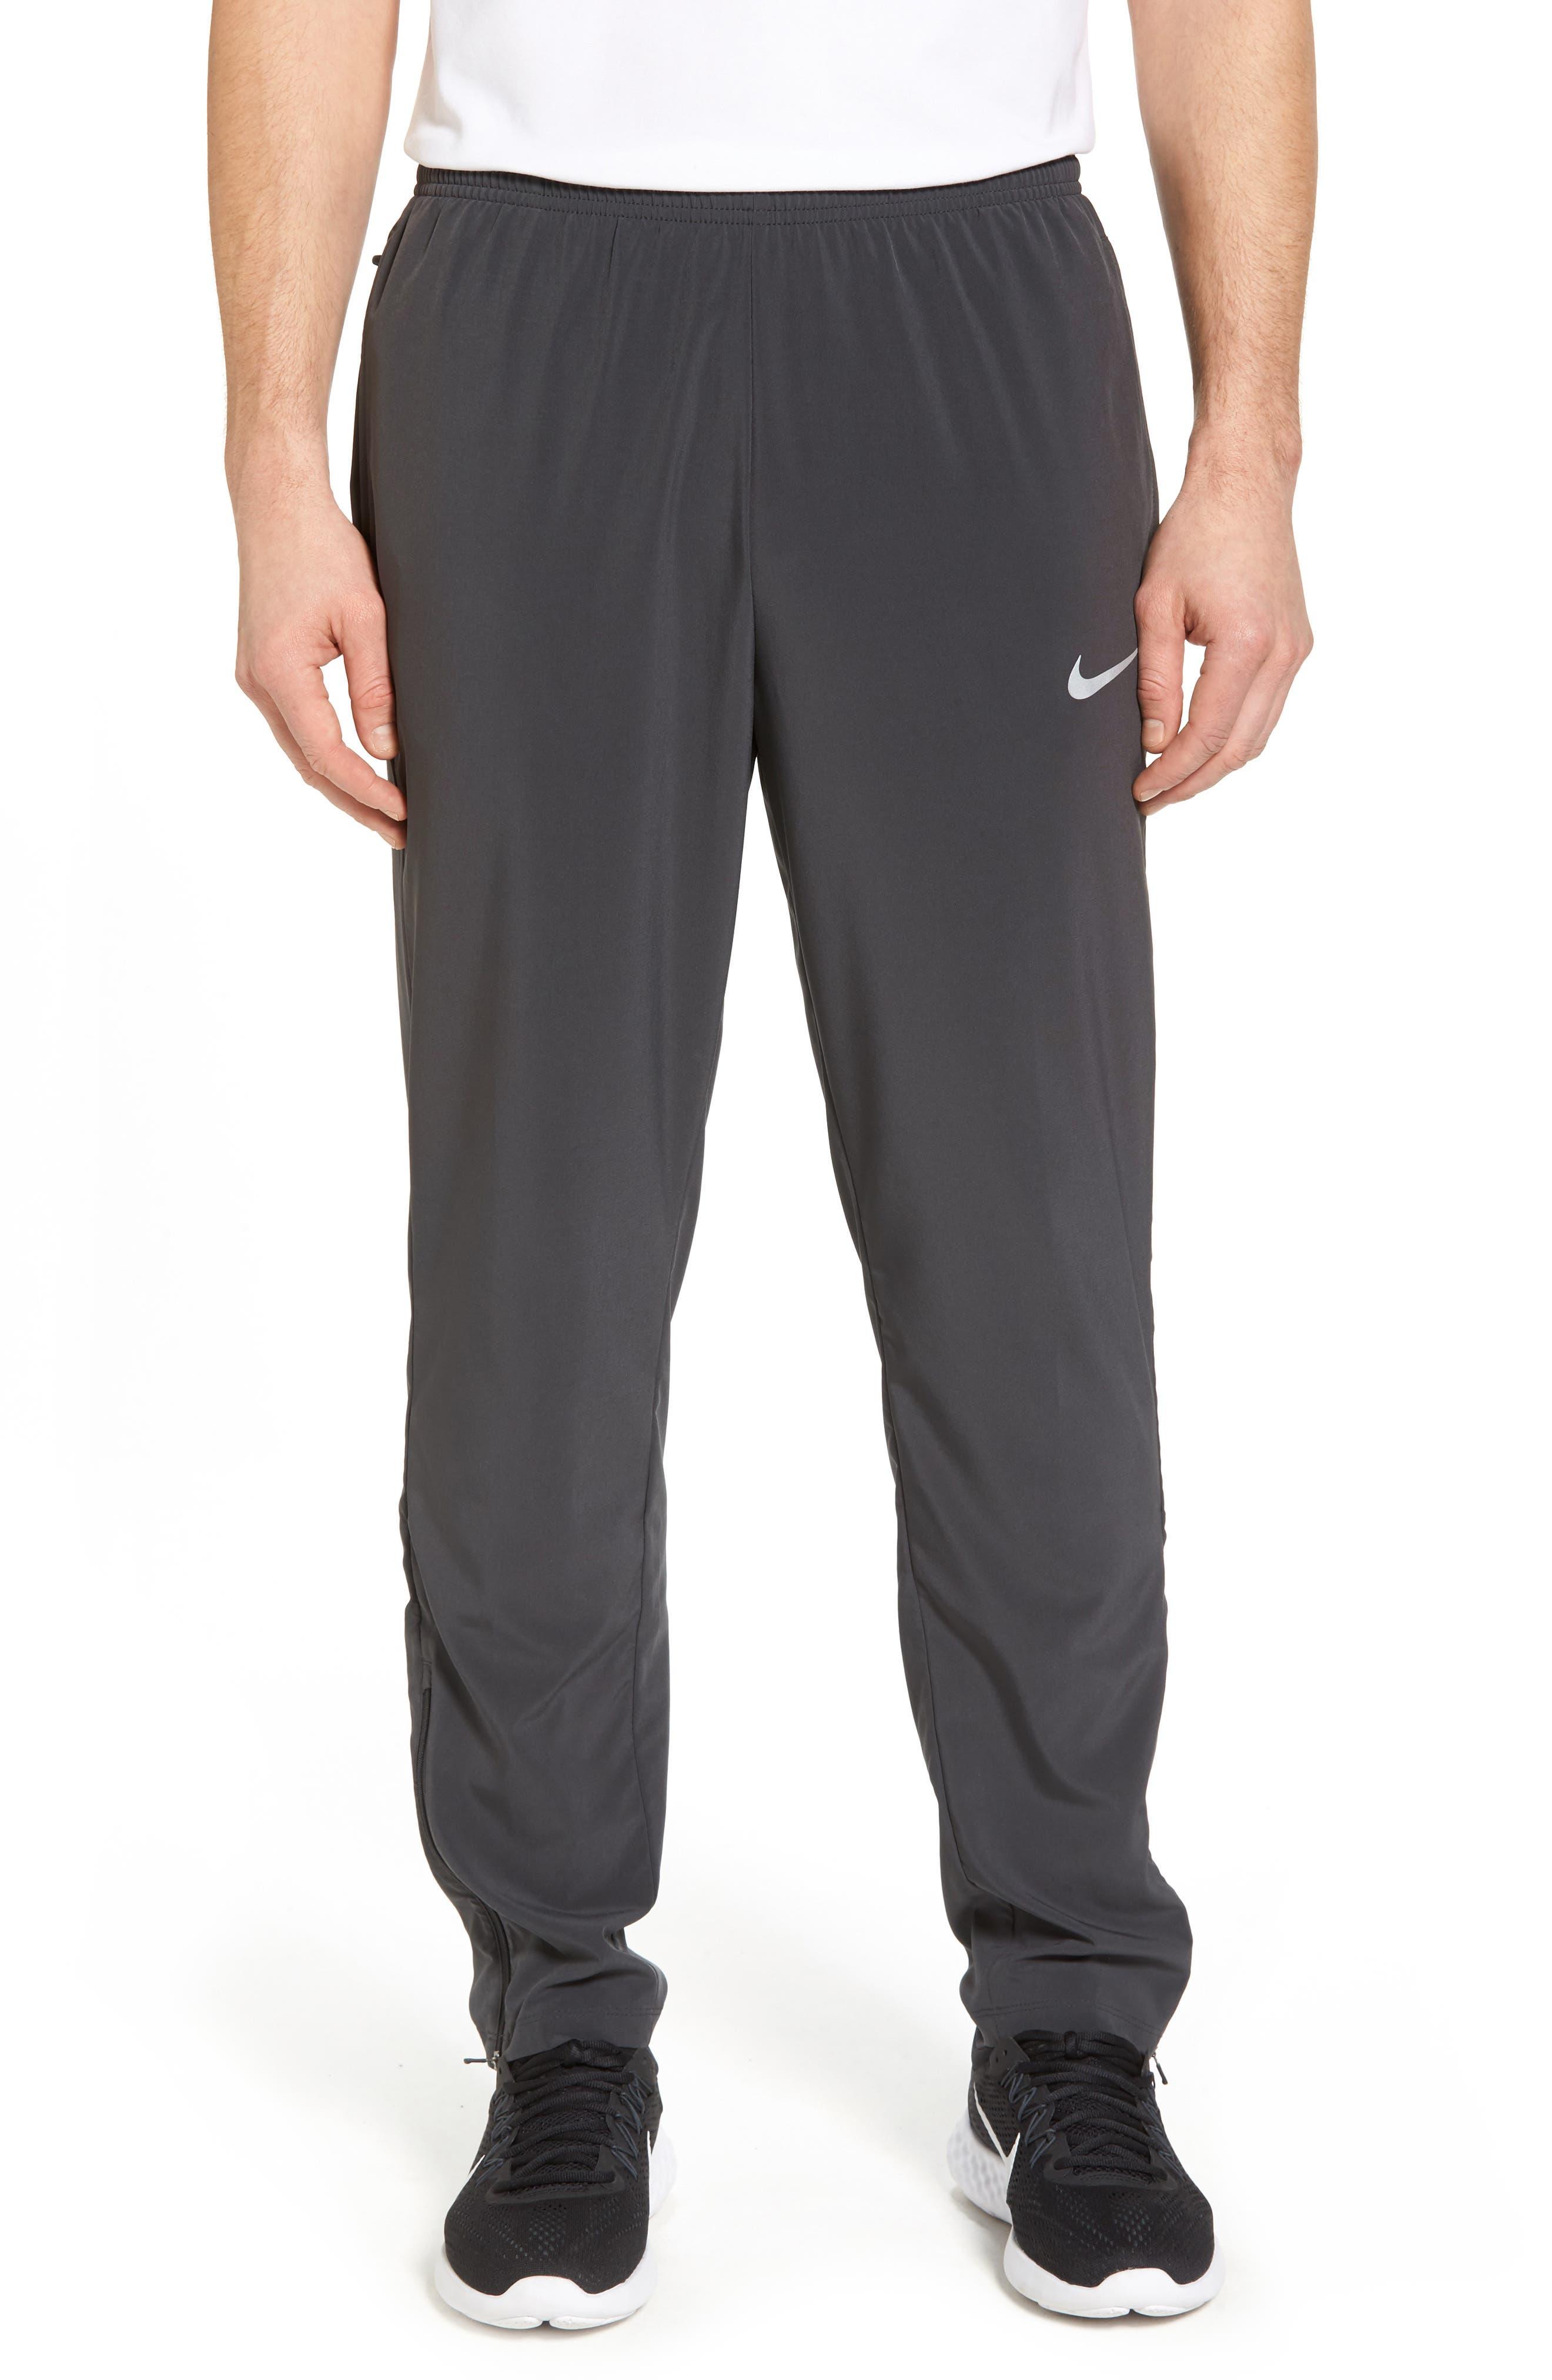 Flex Running Pants,                         Main,                         color,